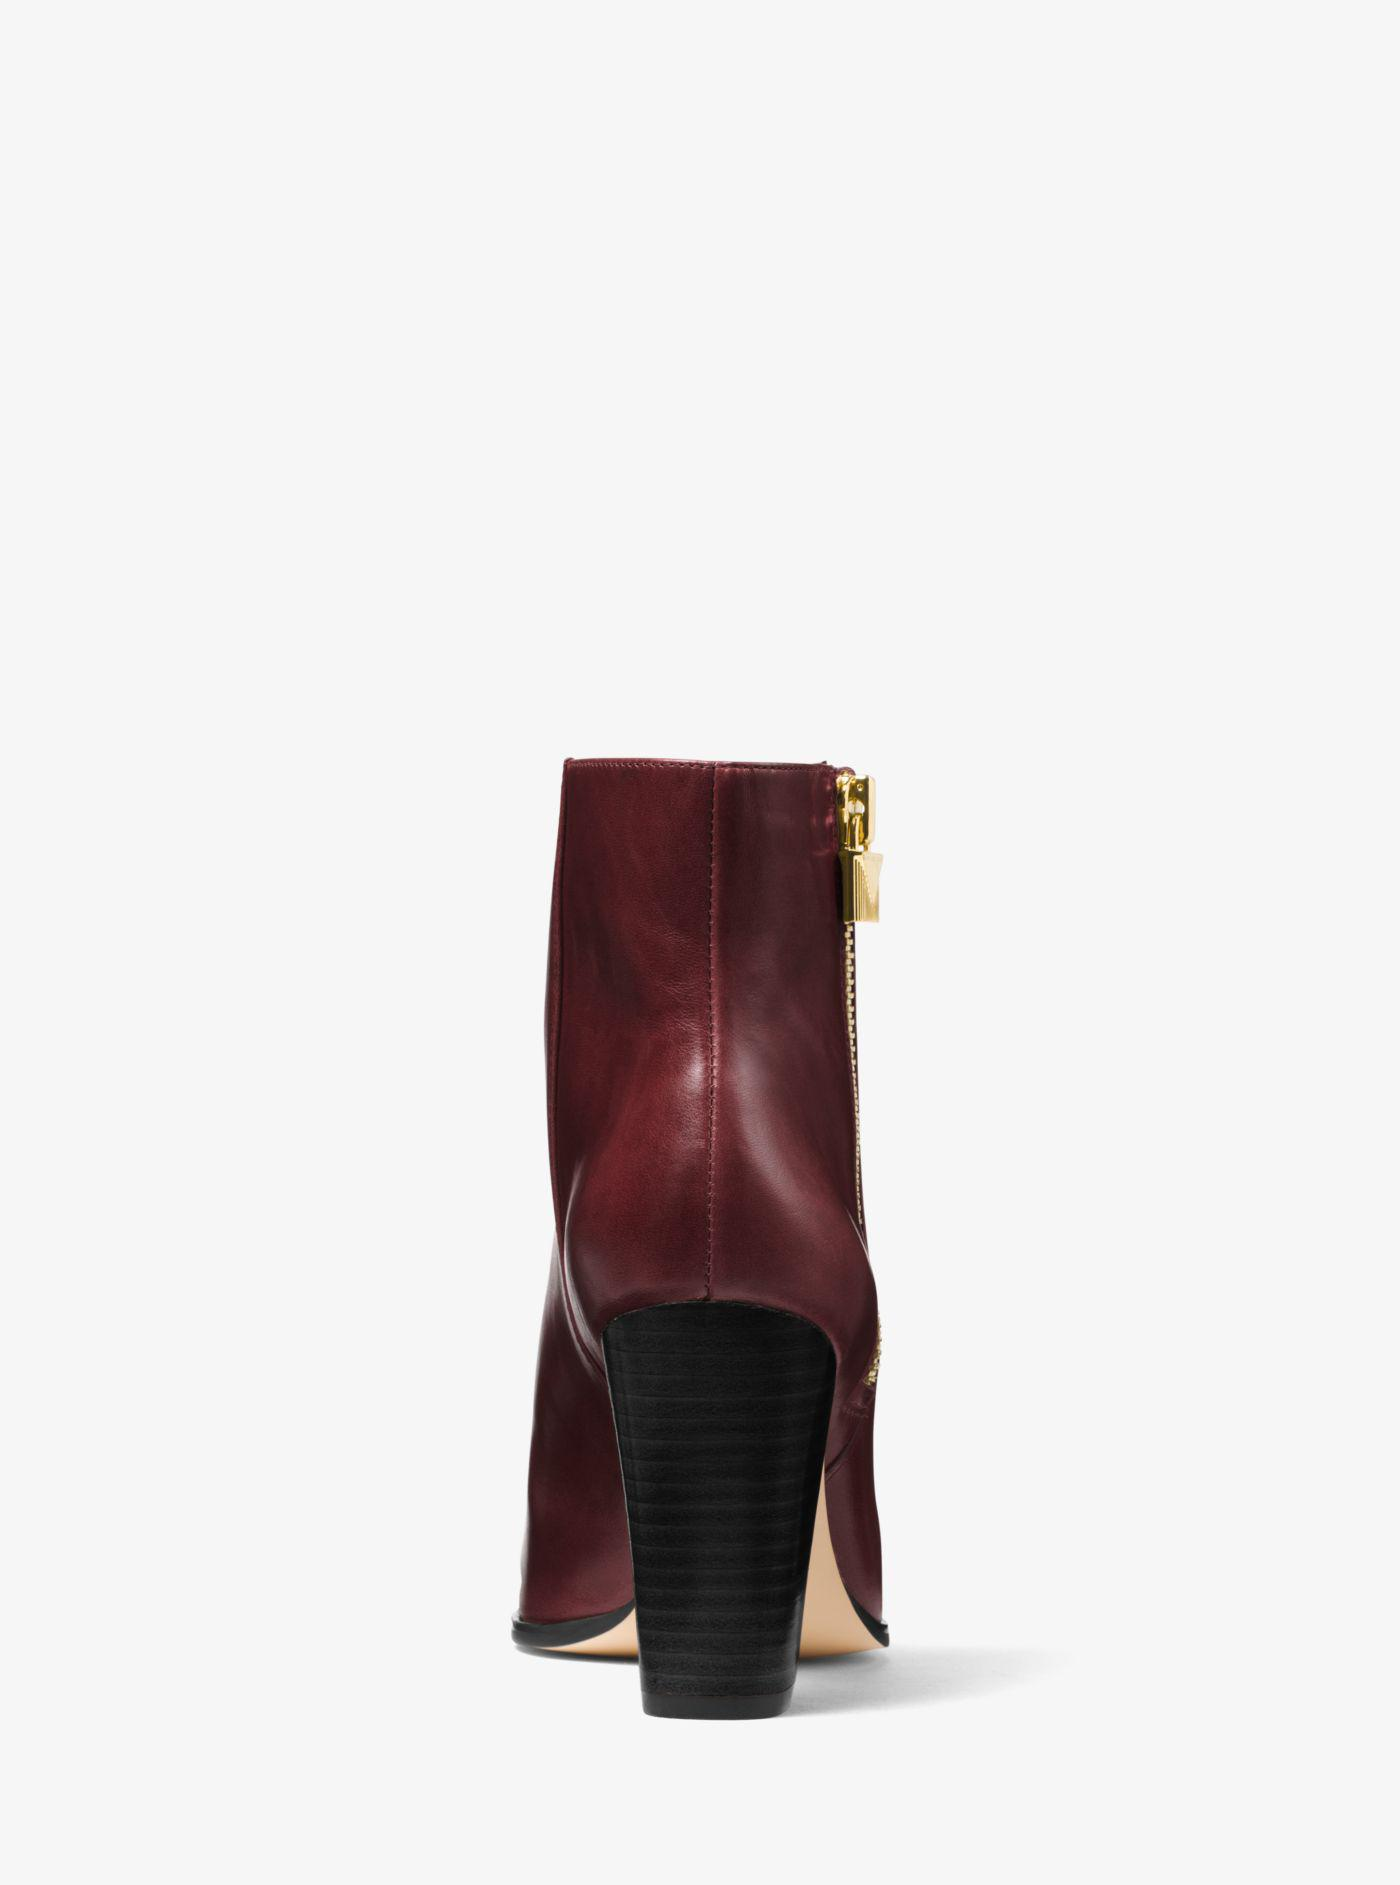 3a6e2b17e125 Michael Kors Michael Margaret Block Heel Ankle Boots - Lyst